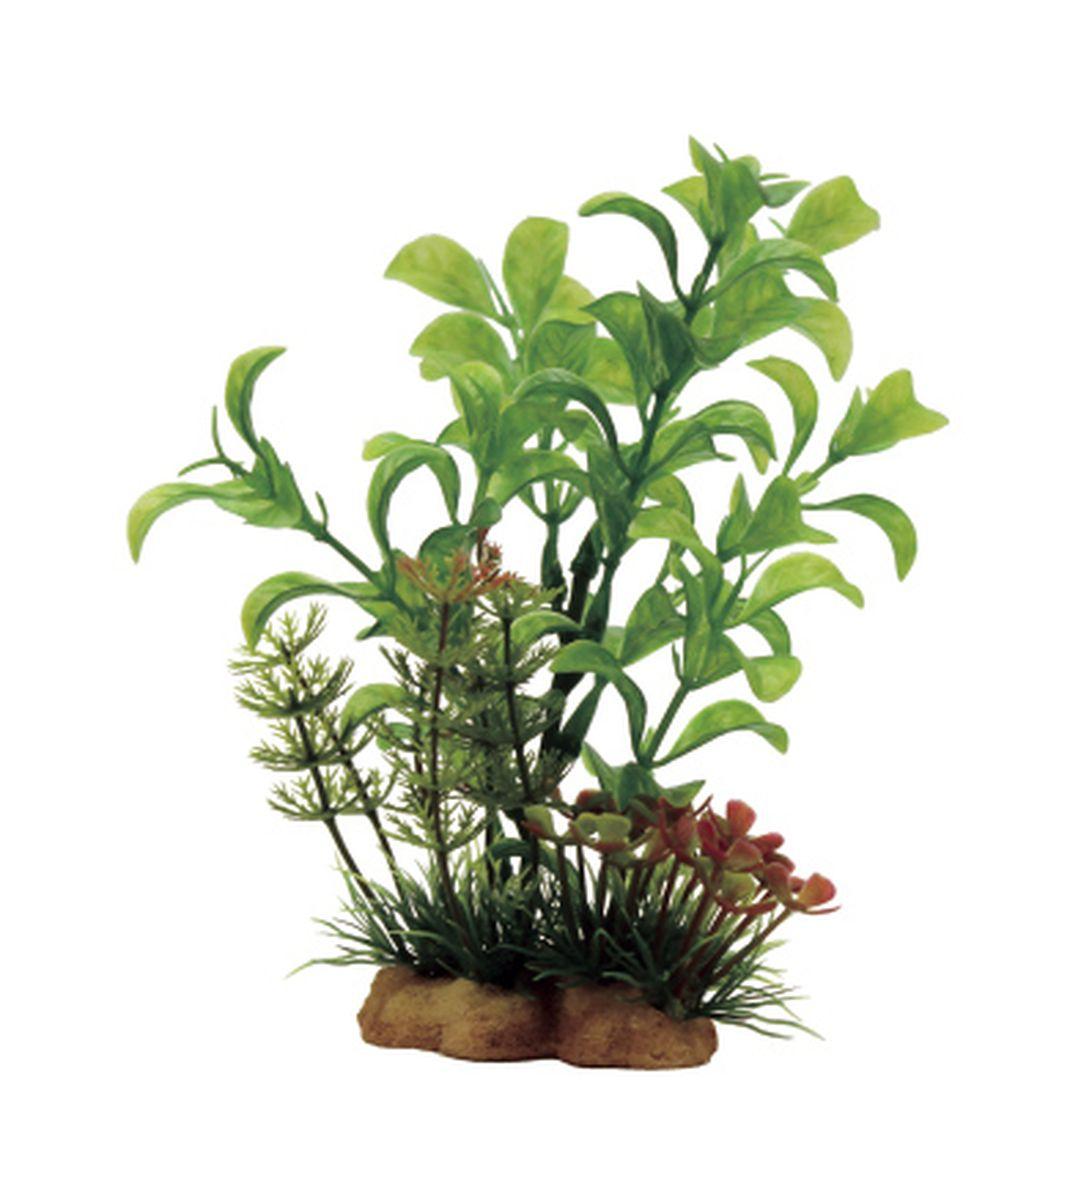 Композиция из растений для аквариума ArtUniq Людвигия, 10 x 5 x 13 смART-1130908Композиция из растений для аквариума ArtUniq Людвигия, 10 x 5 x 13 см